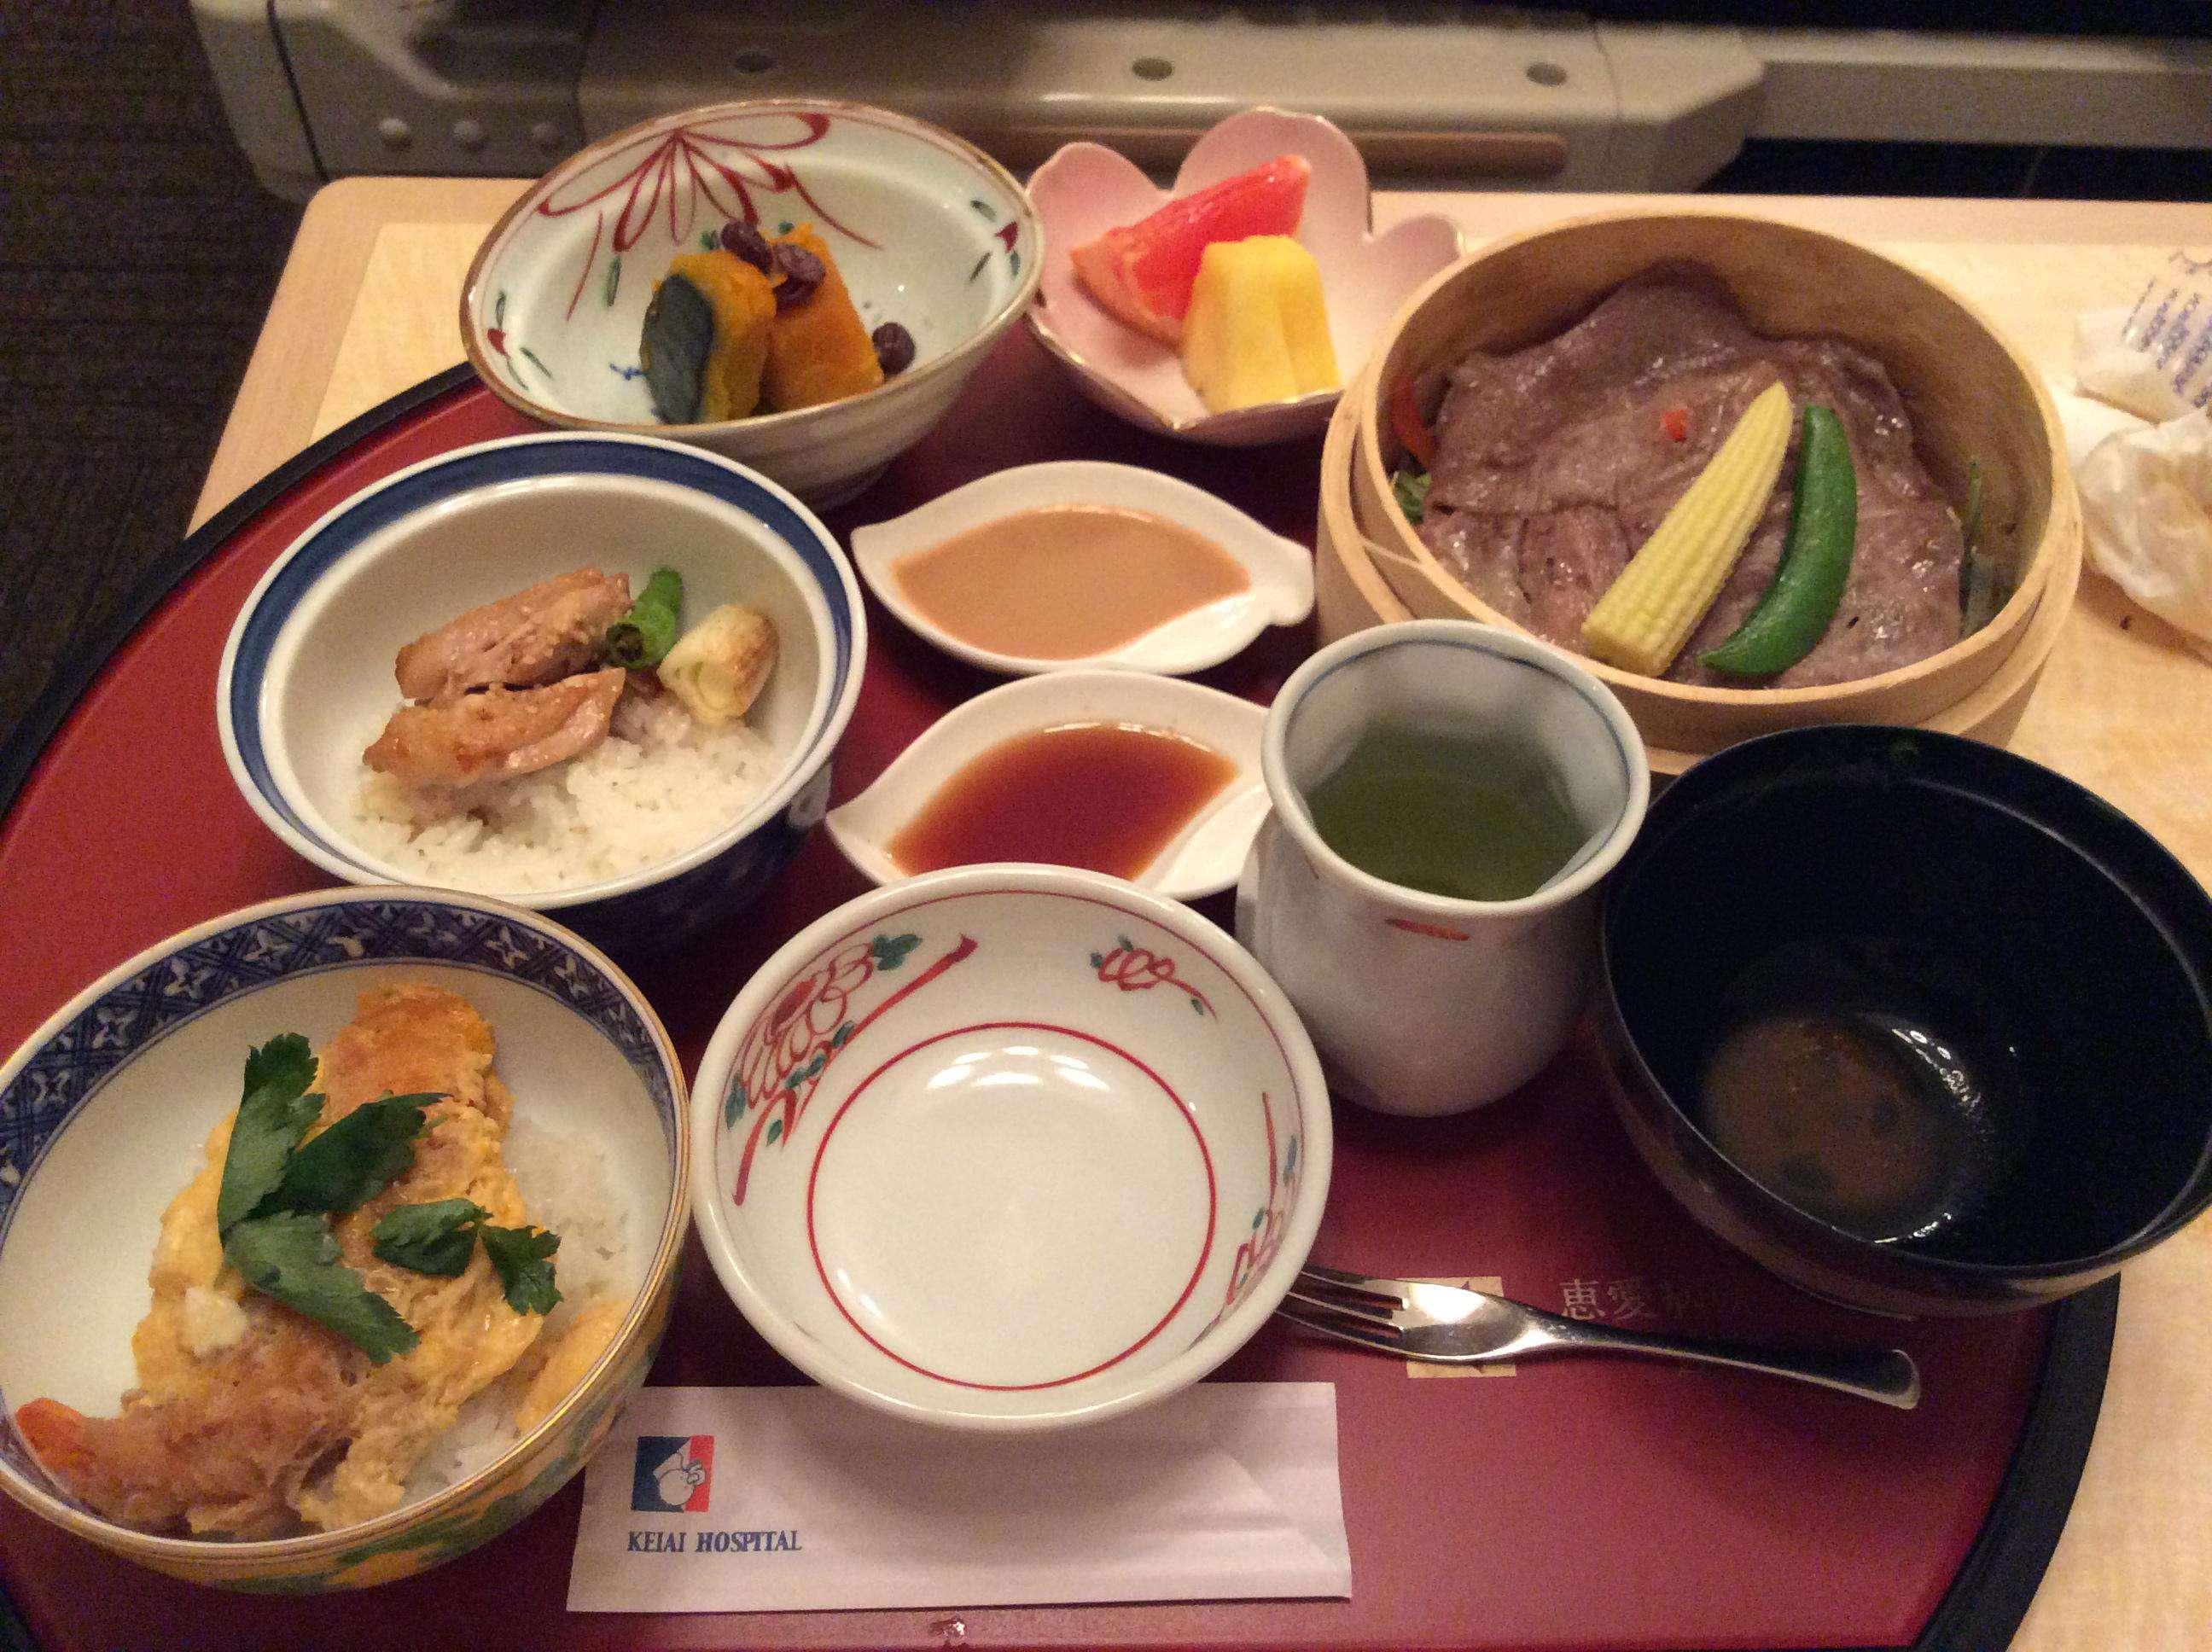 Dinner in room day 0